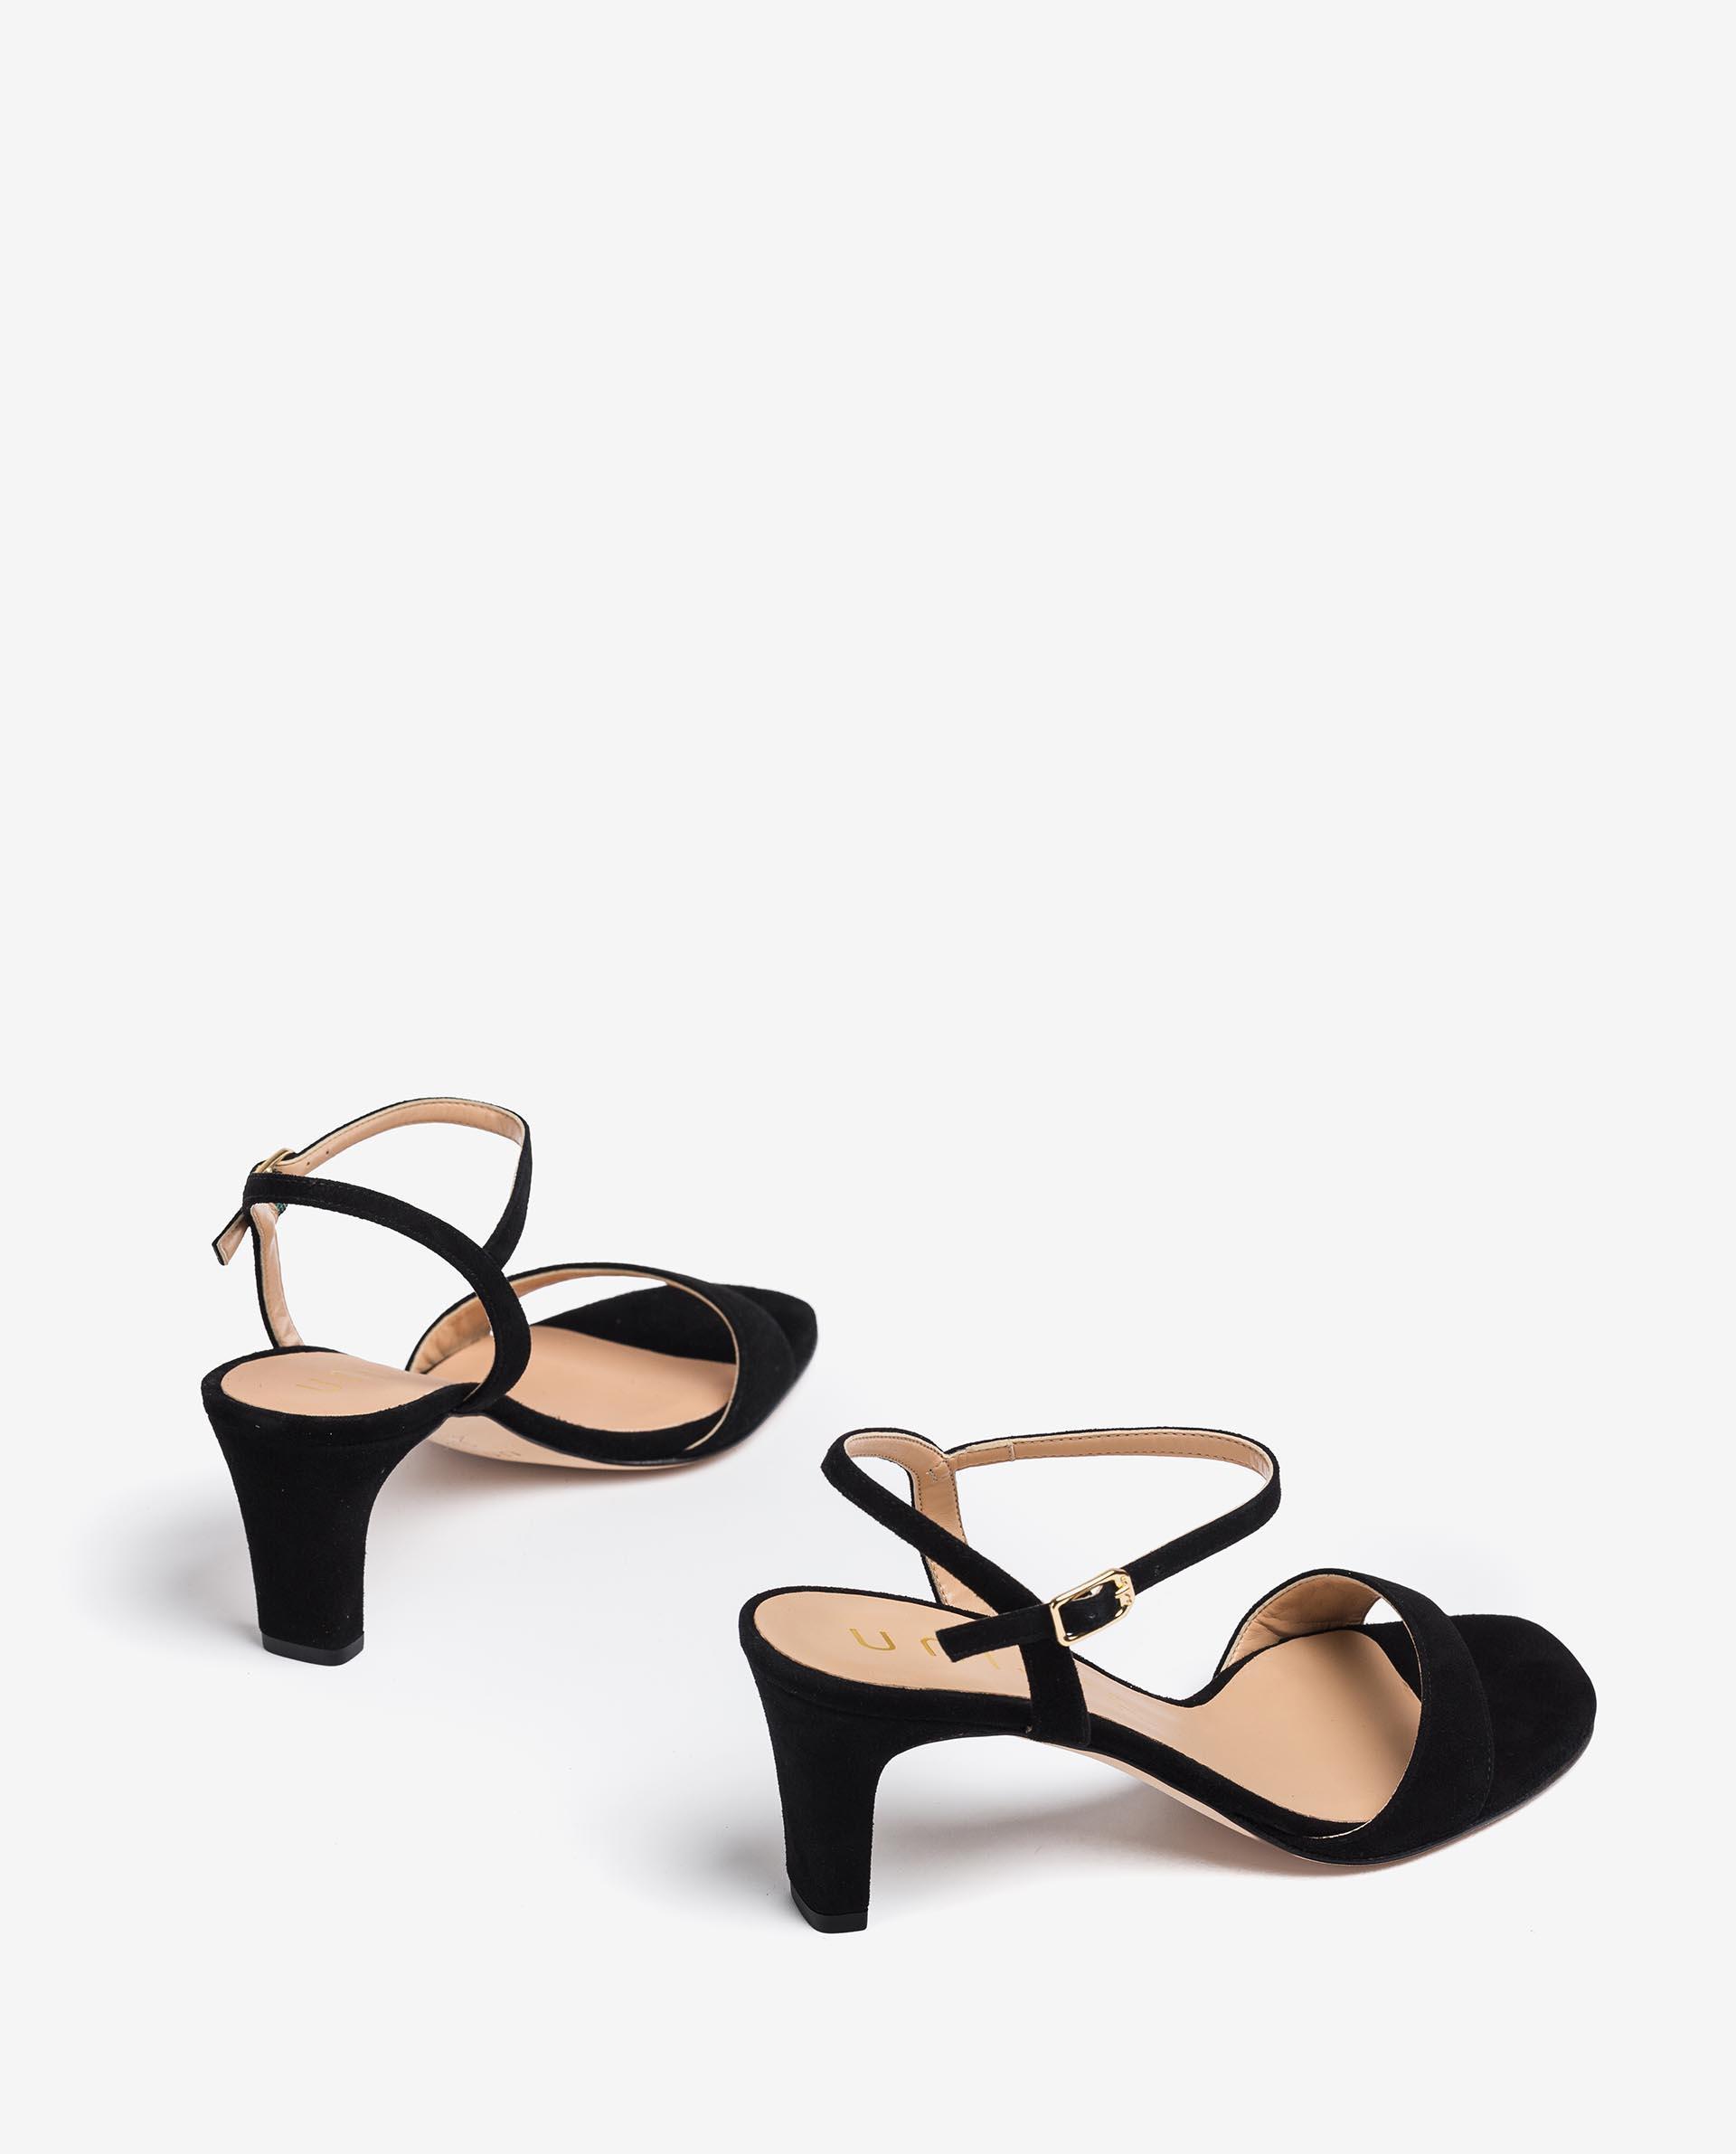 Unisa Sandals MECHI_21_KS black